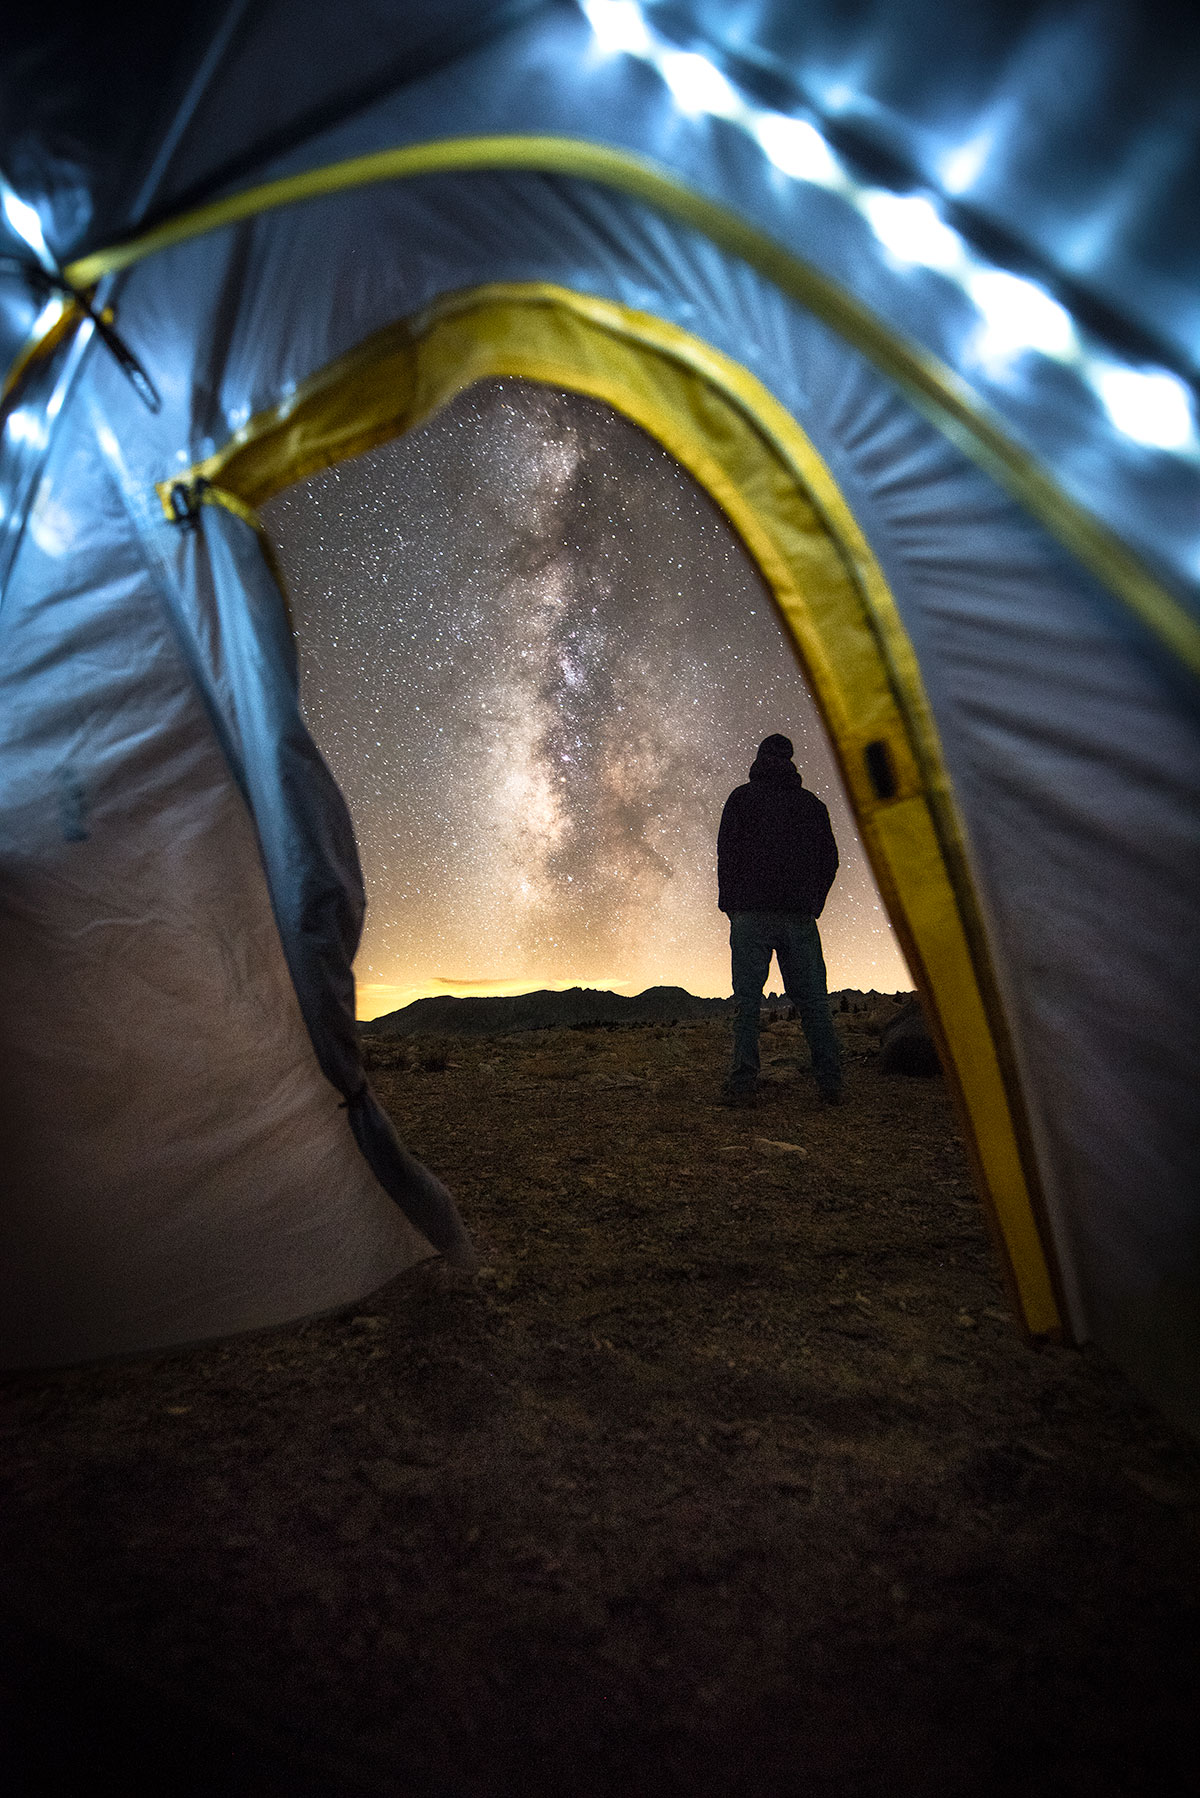 austin-trigg-big-agnes-tent-john-muir-trail-camping-Bighorn-Plateau-Milky-way-tent-view.jpg